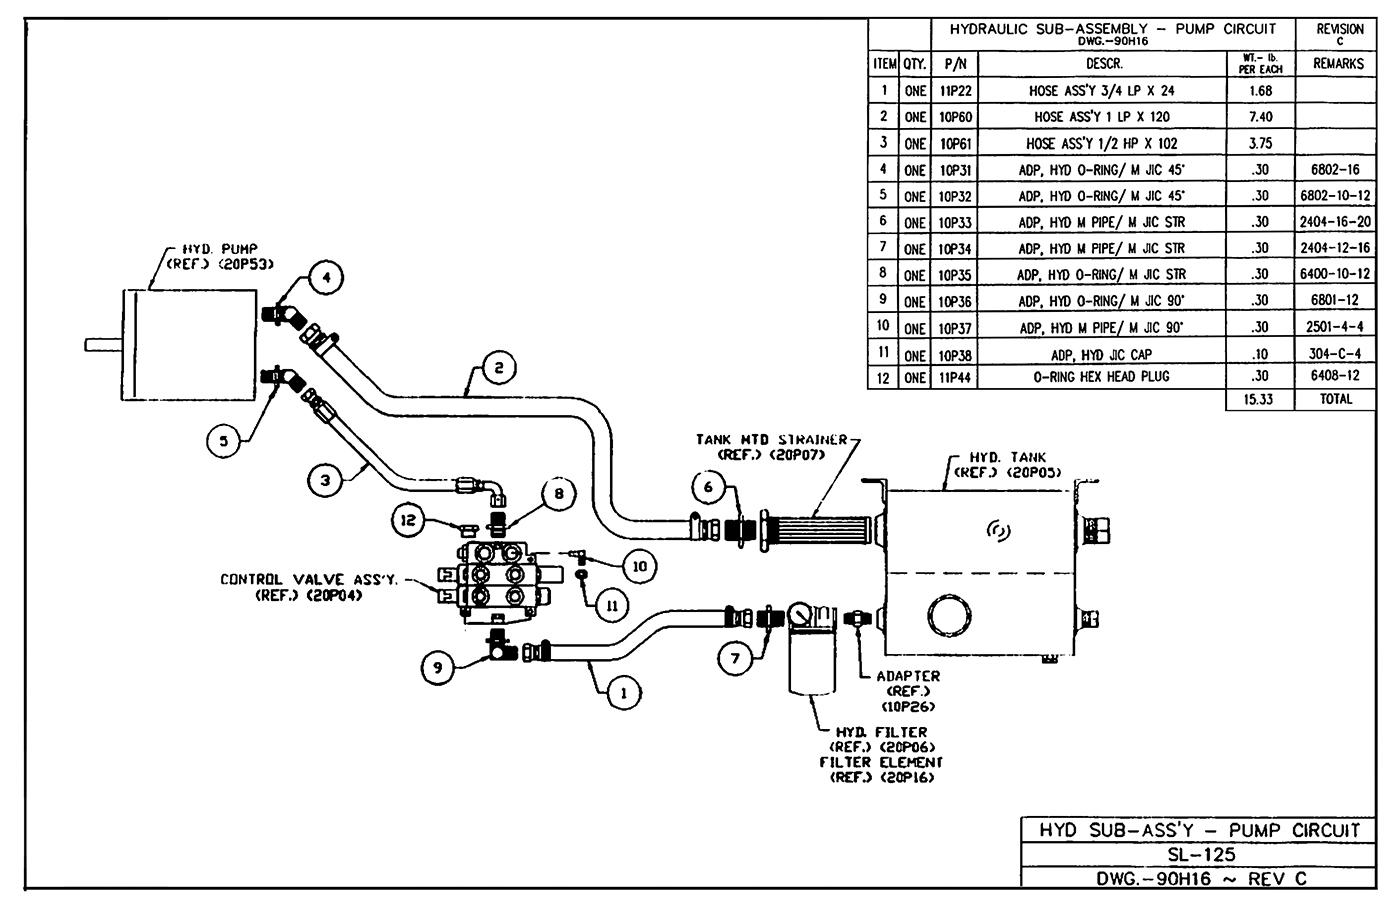 Sl125 Wiring Diagram Electrical Diagrams Honda Qr50 Iteparts Com Intercon Truck Equipment Online Store